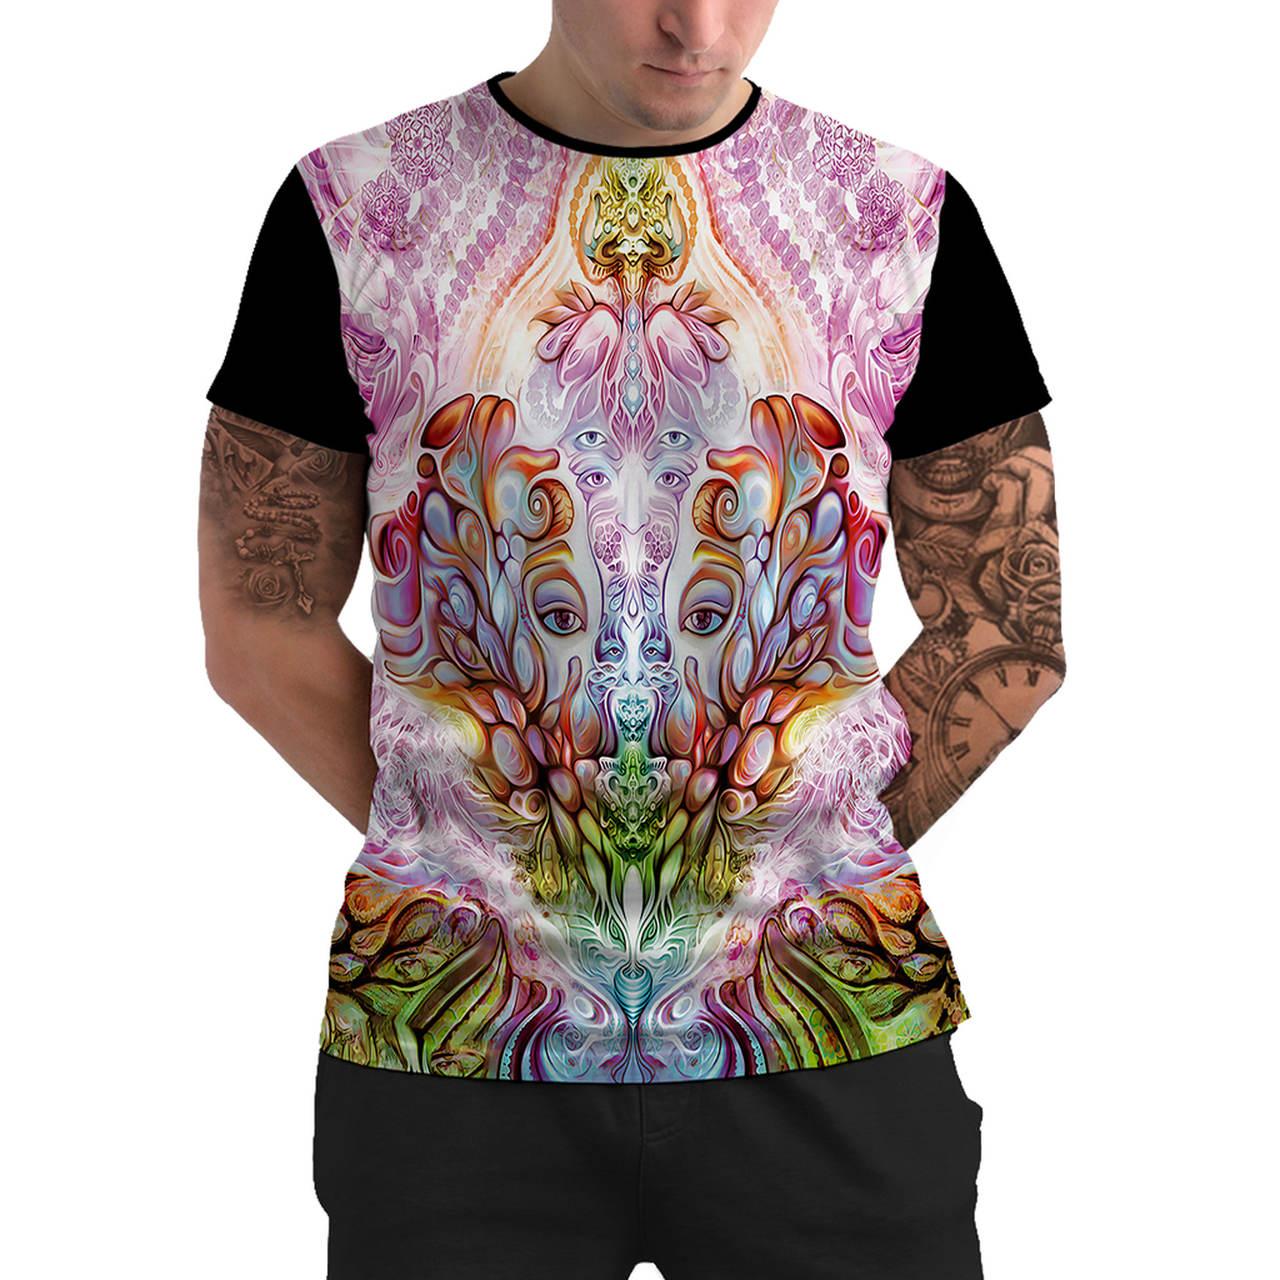 Stompy Camiseta Manga Curta Psicodelica Modelo 31